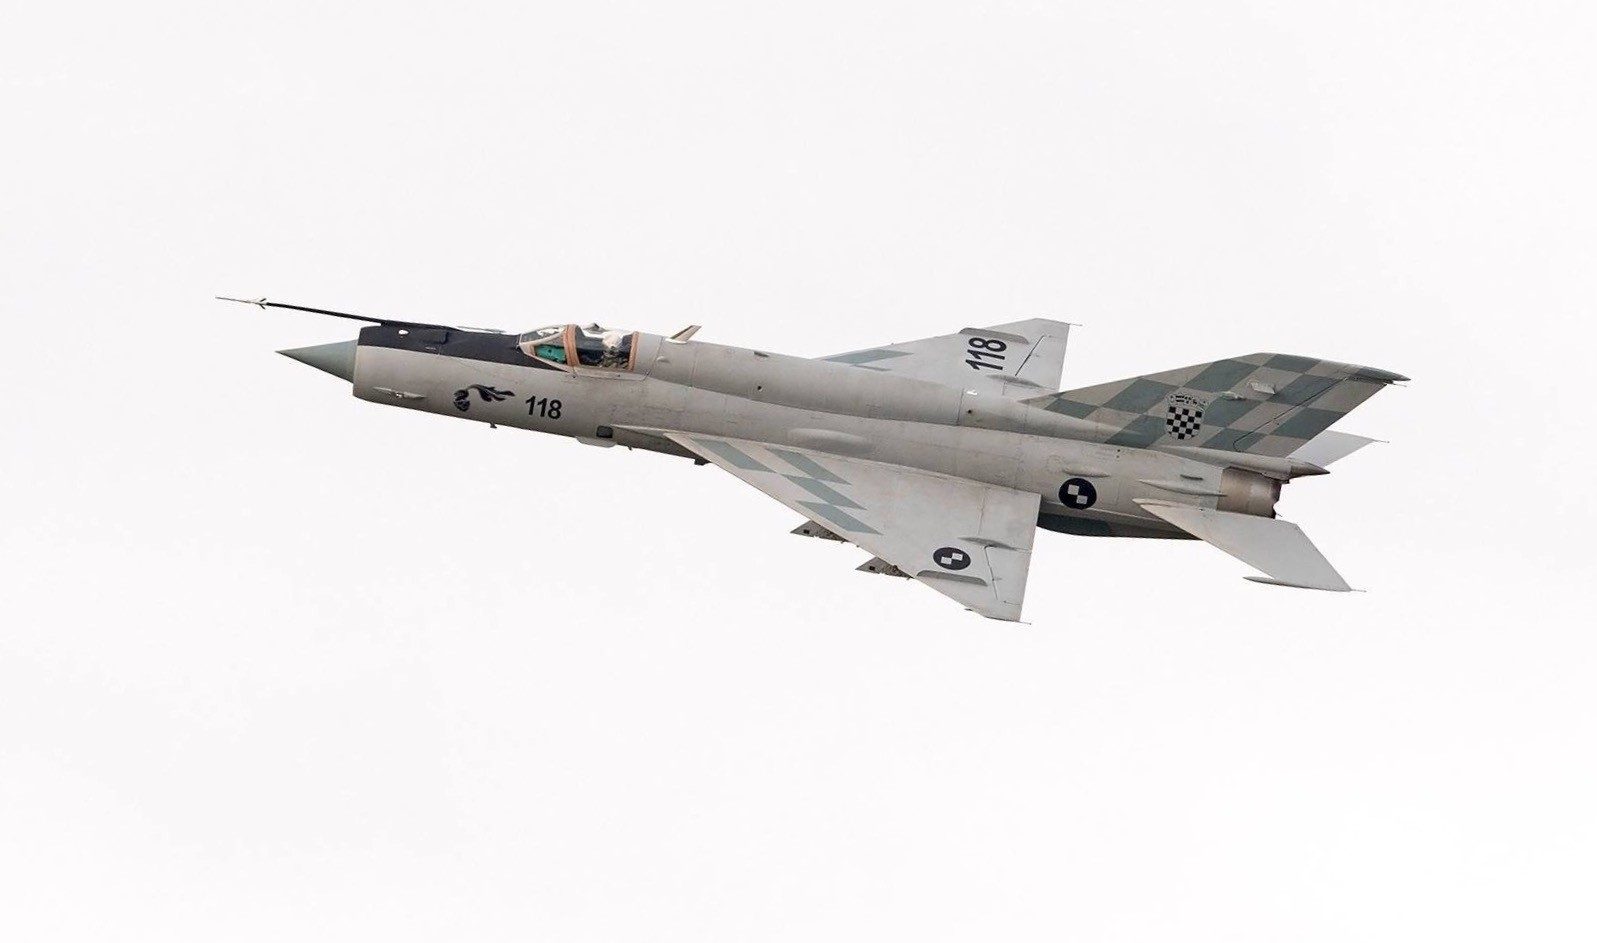 Hrvaški MiG-21BisD